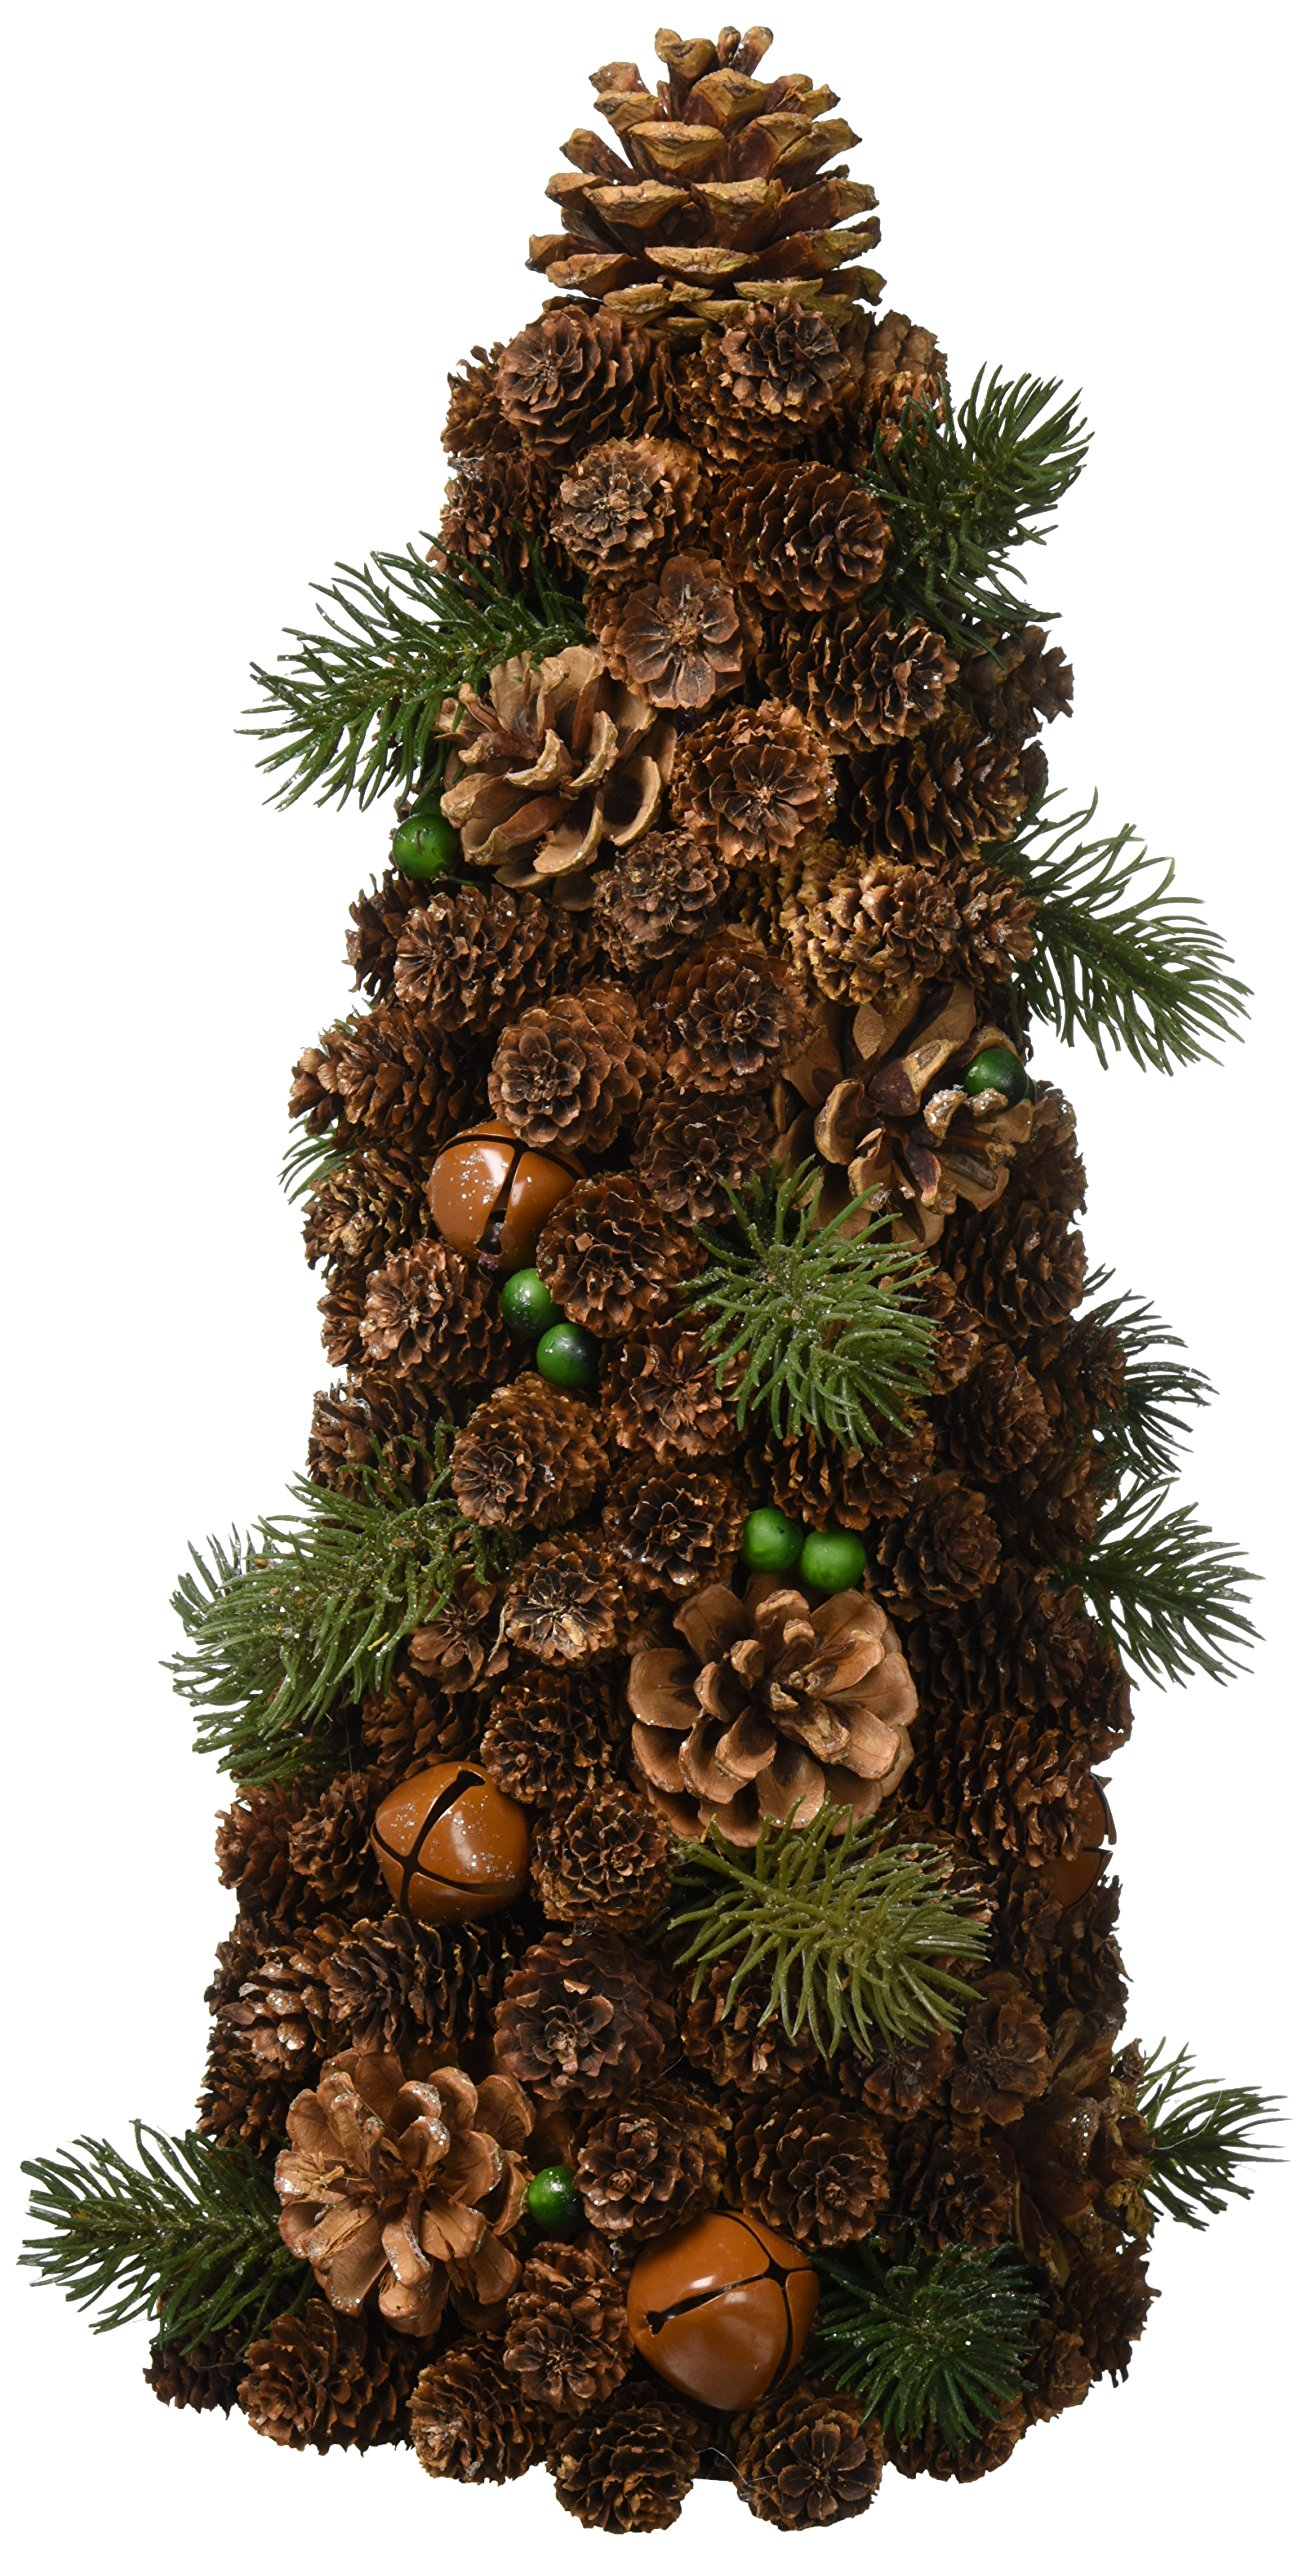 Koehler 10016130 14.5 Inch Pine Cone Small Tree Decor